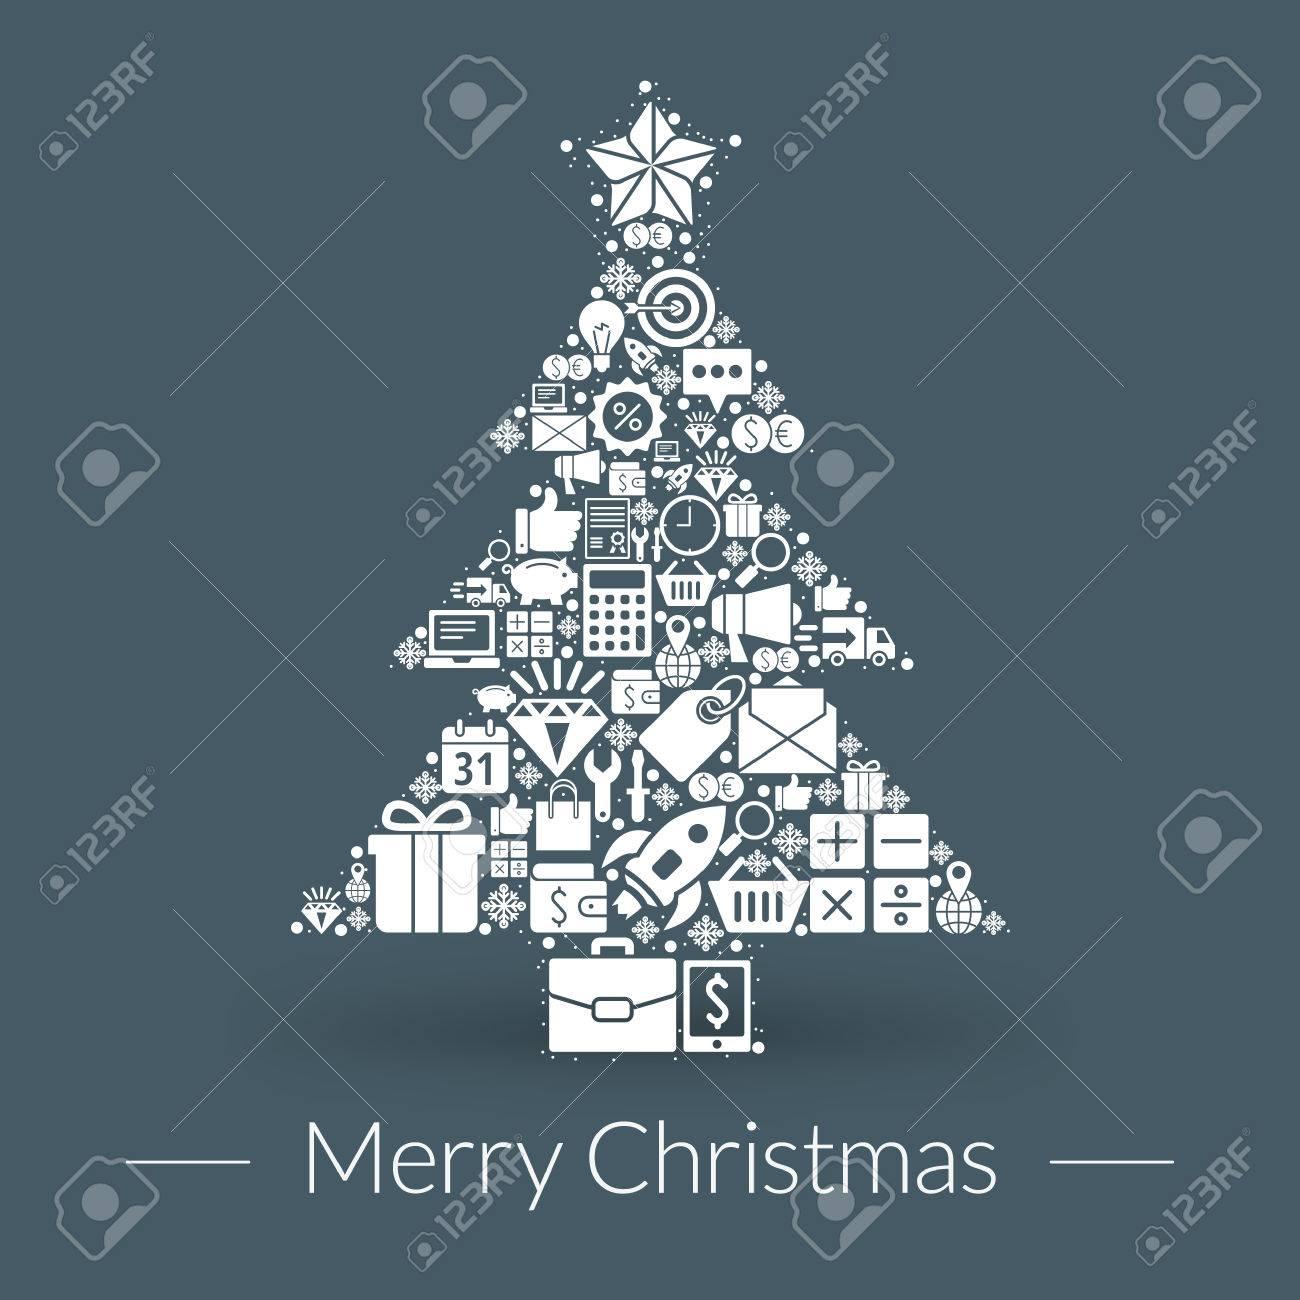 Christmas Greeting Card Icons And Symbols Tree Snowflakes Gift Box